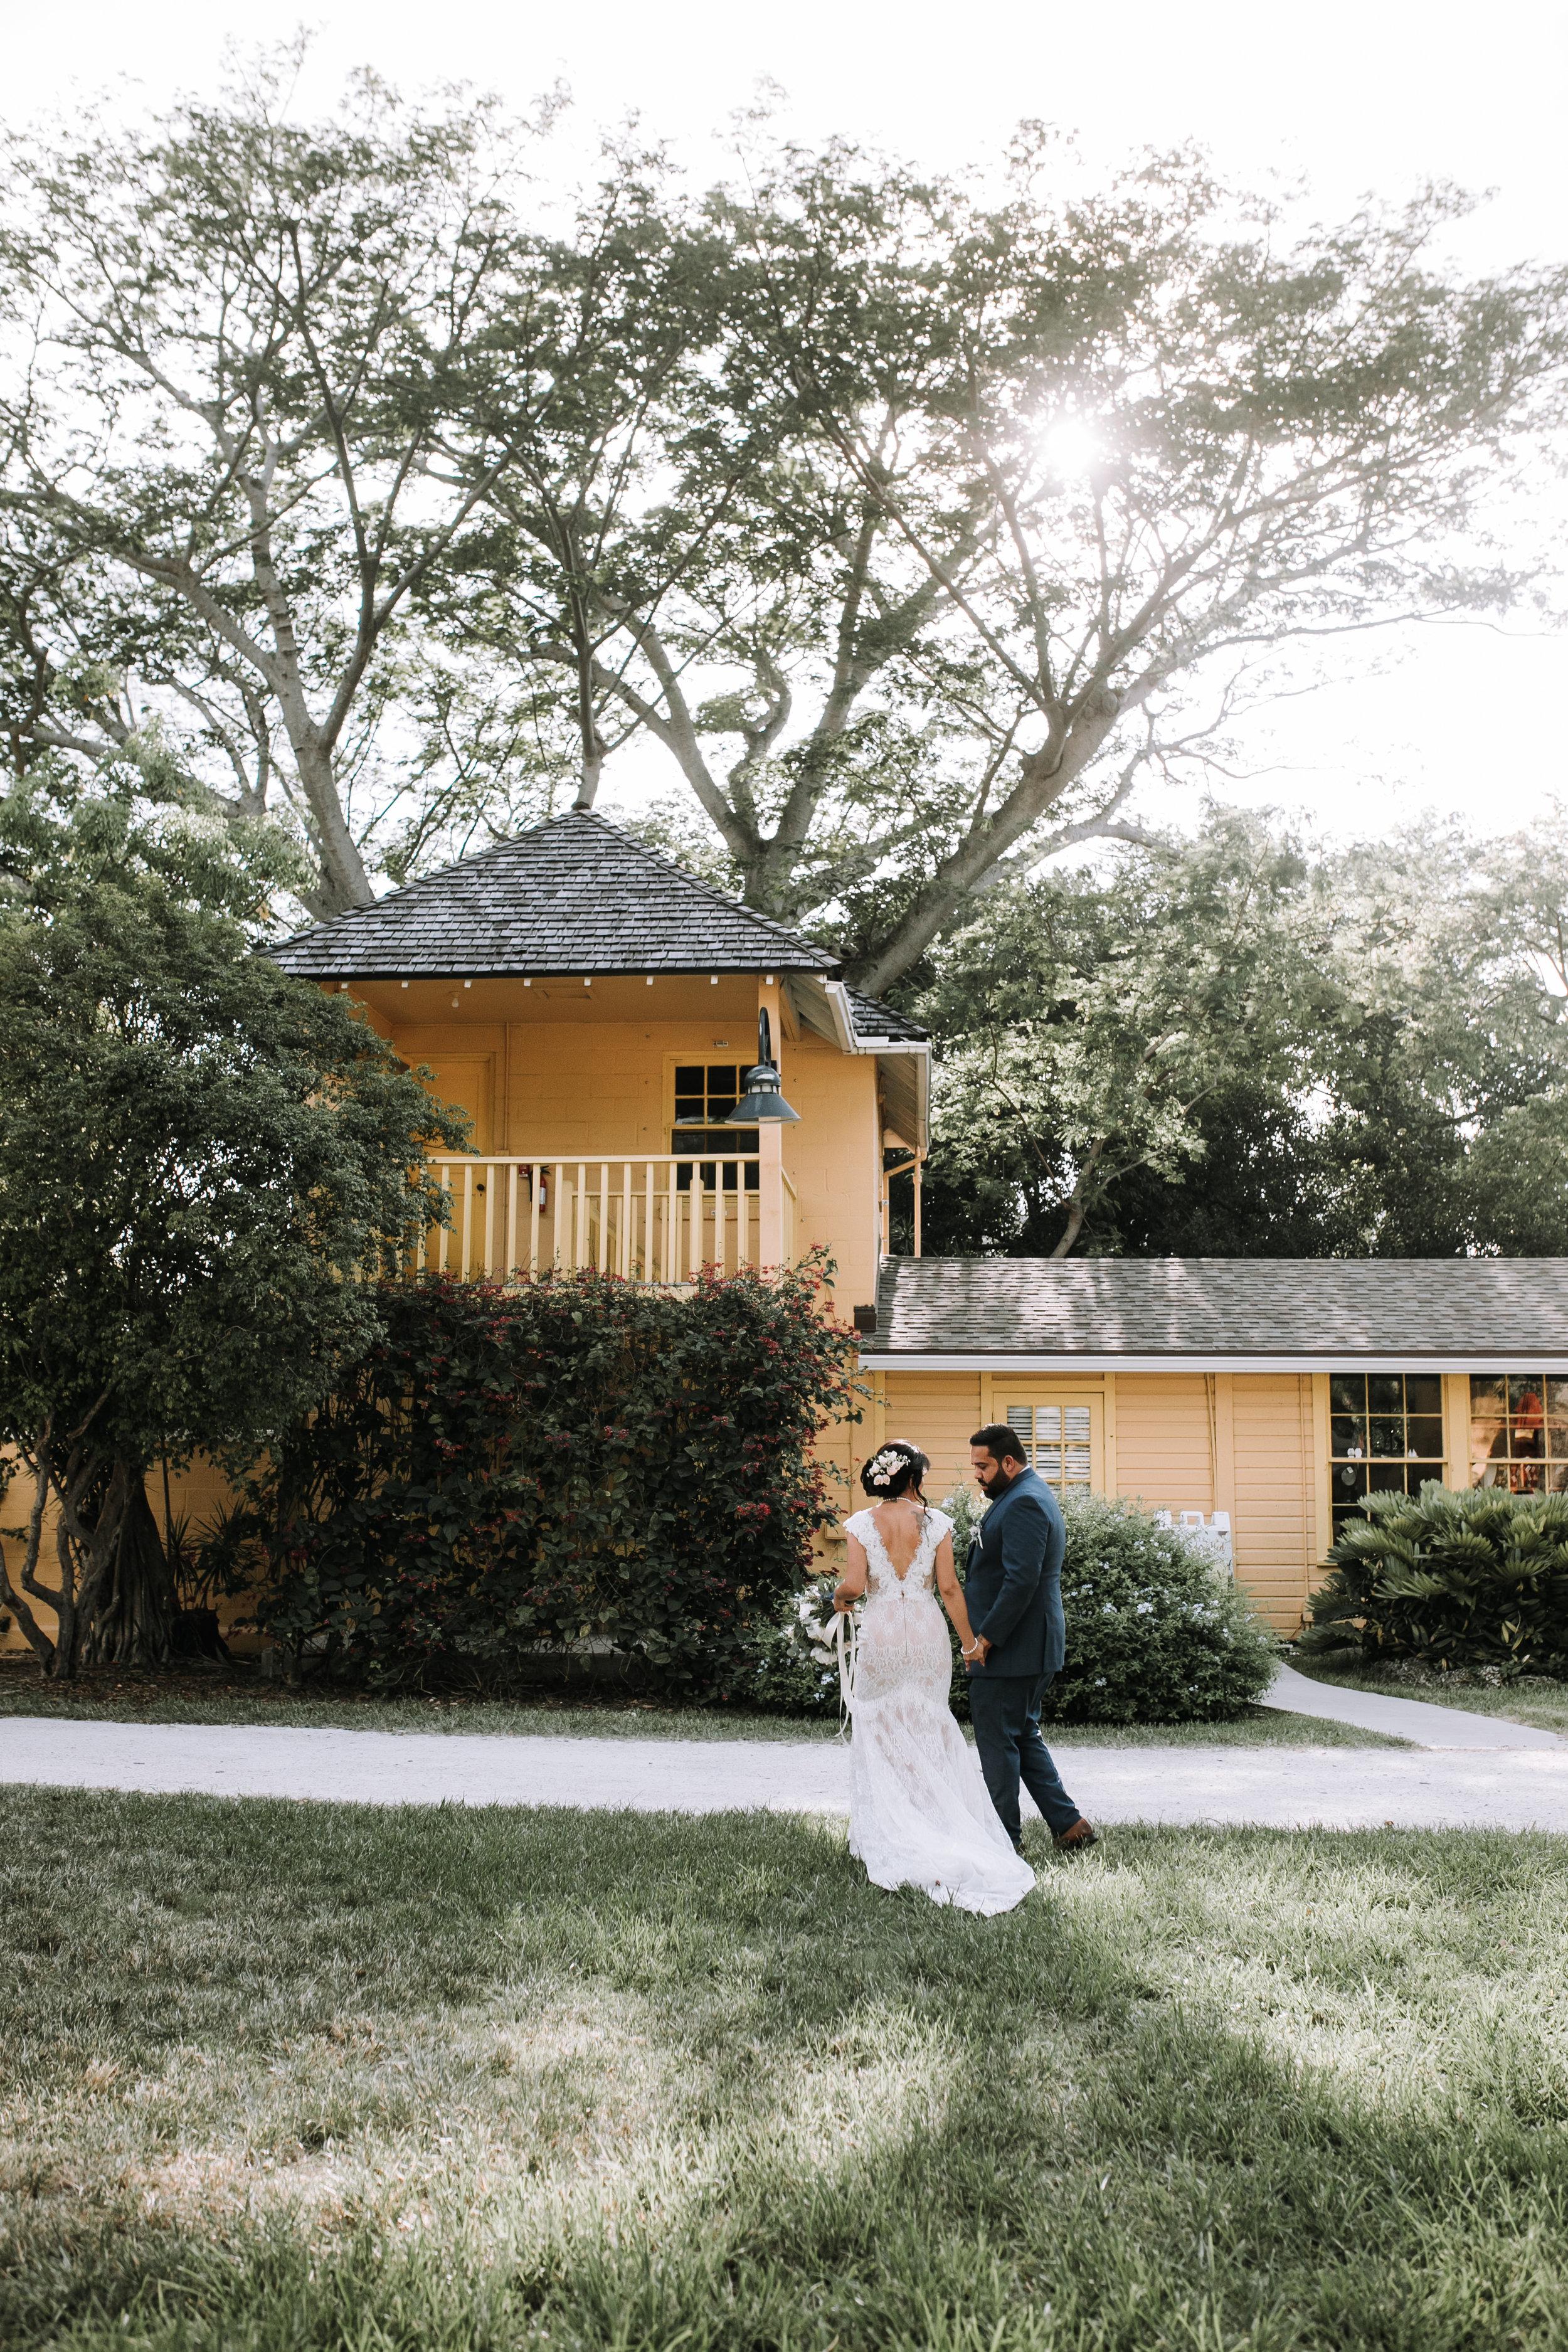 Bonett-House-wedding-fort-lauderdale-florida-Rkm-Photography-69.jpg